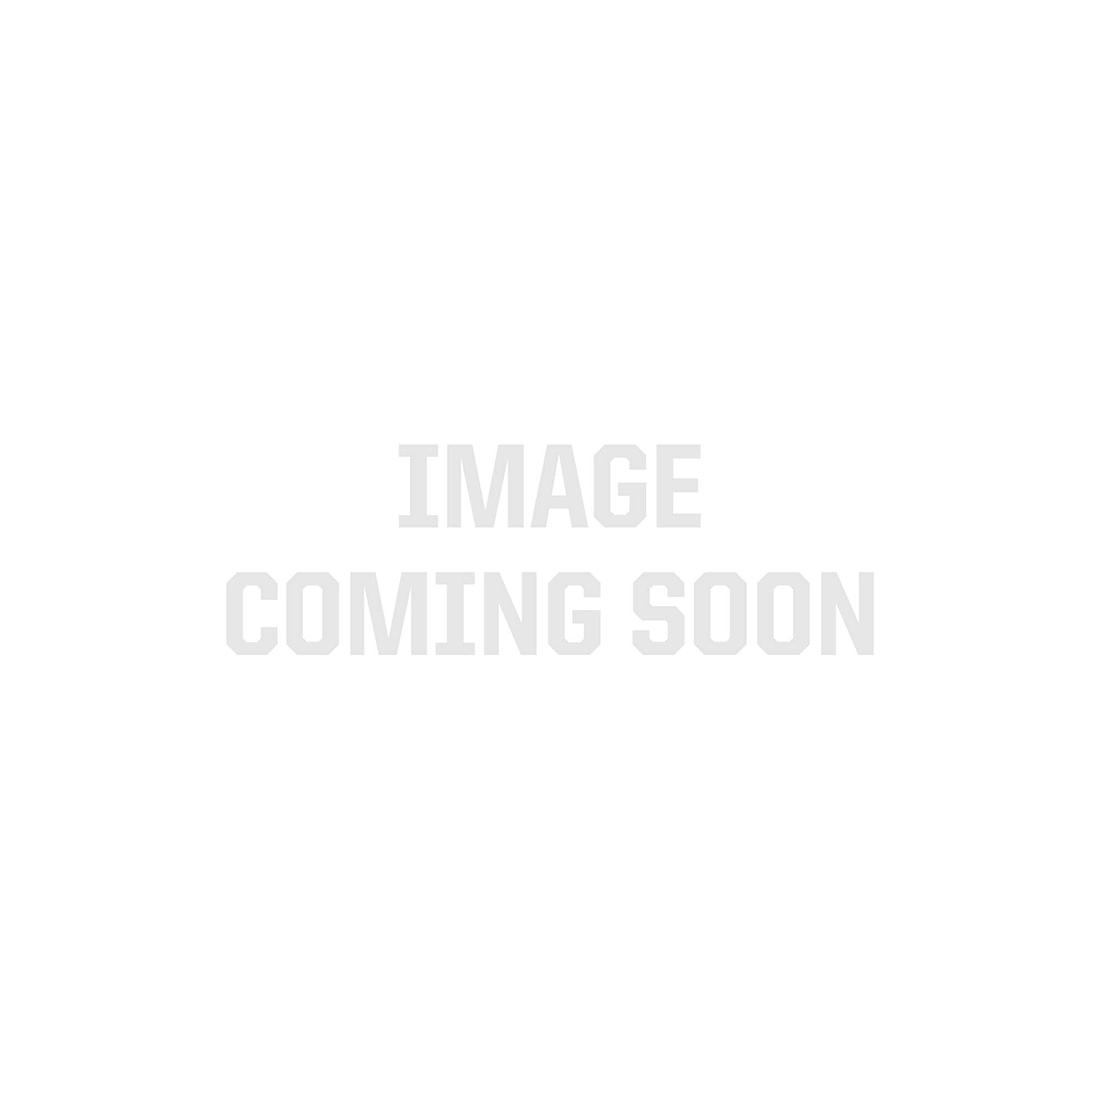 Amber 3528 Quad Row LED Strip Light, 450/m, 28mm wide, Sample Kit